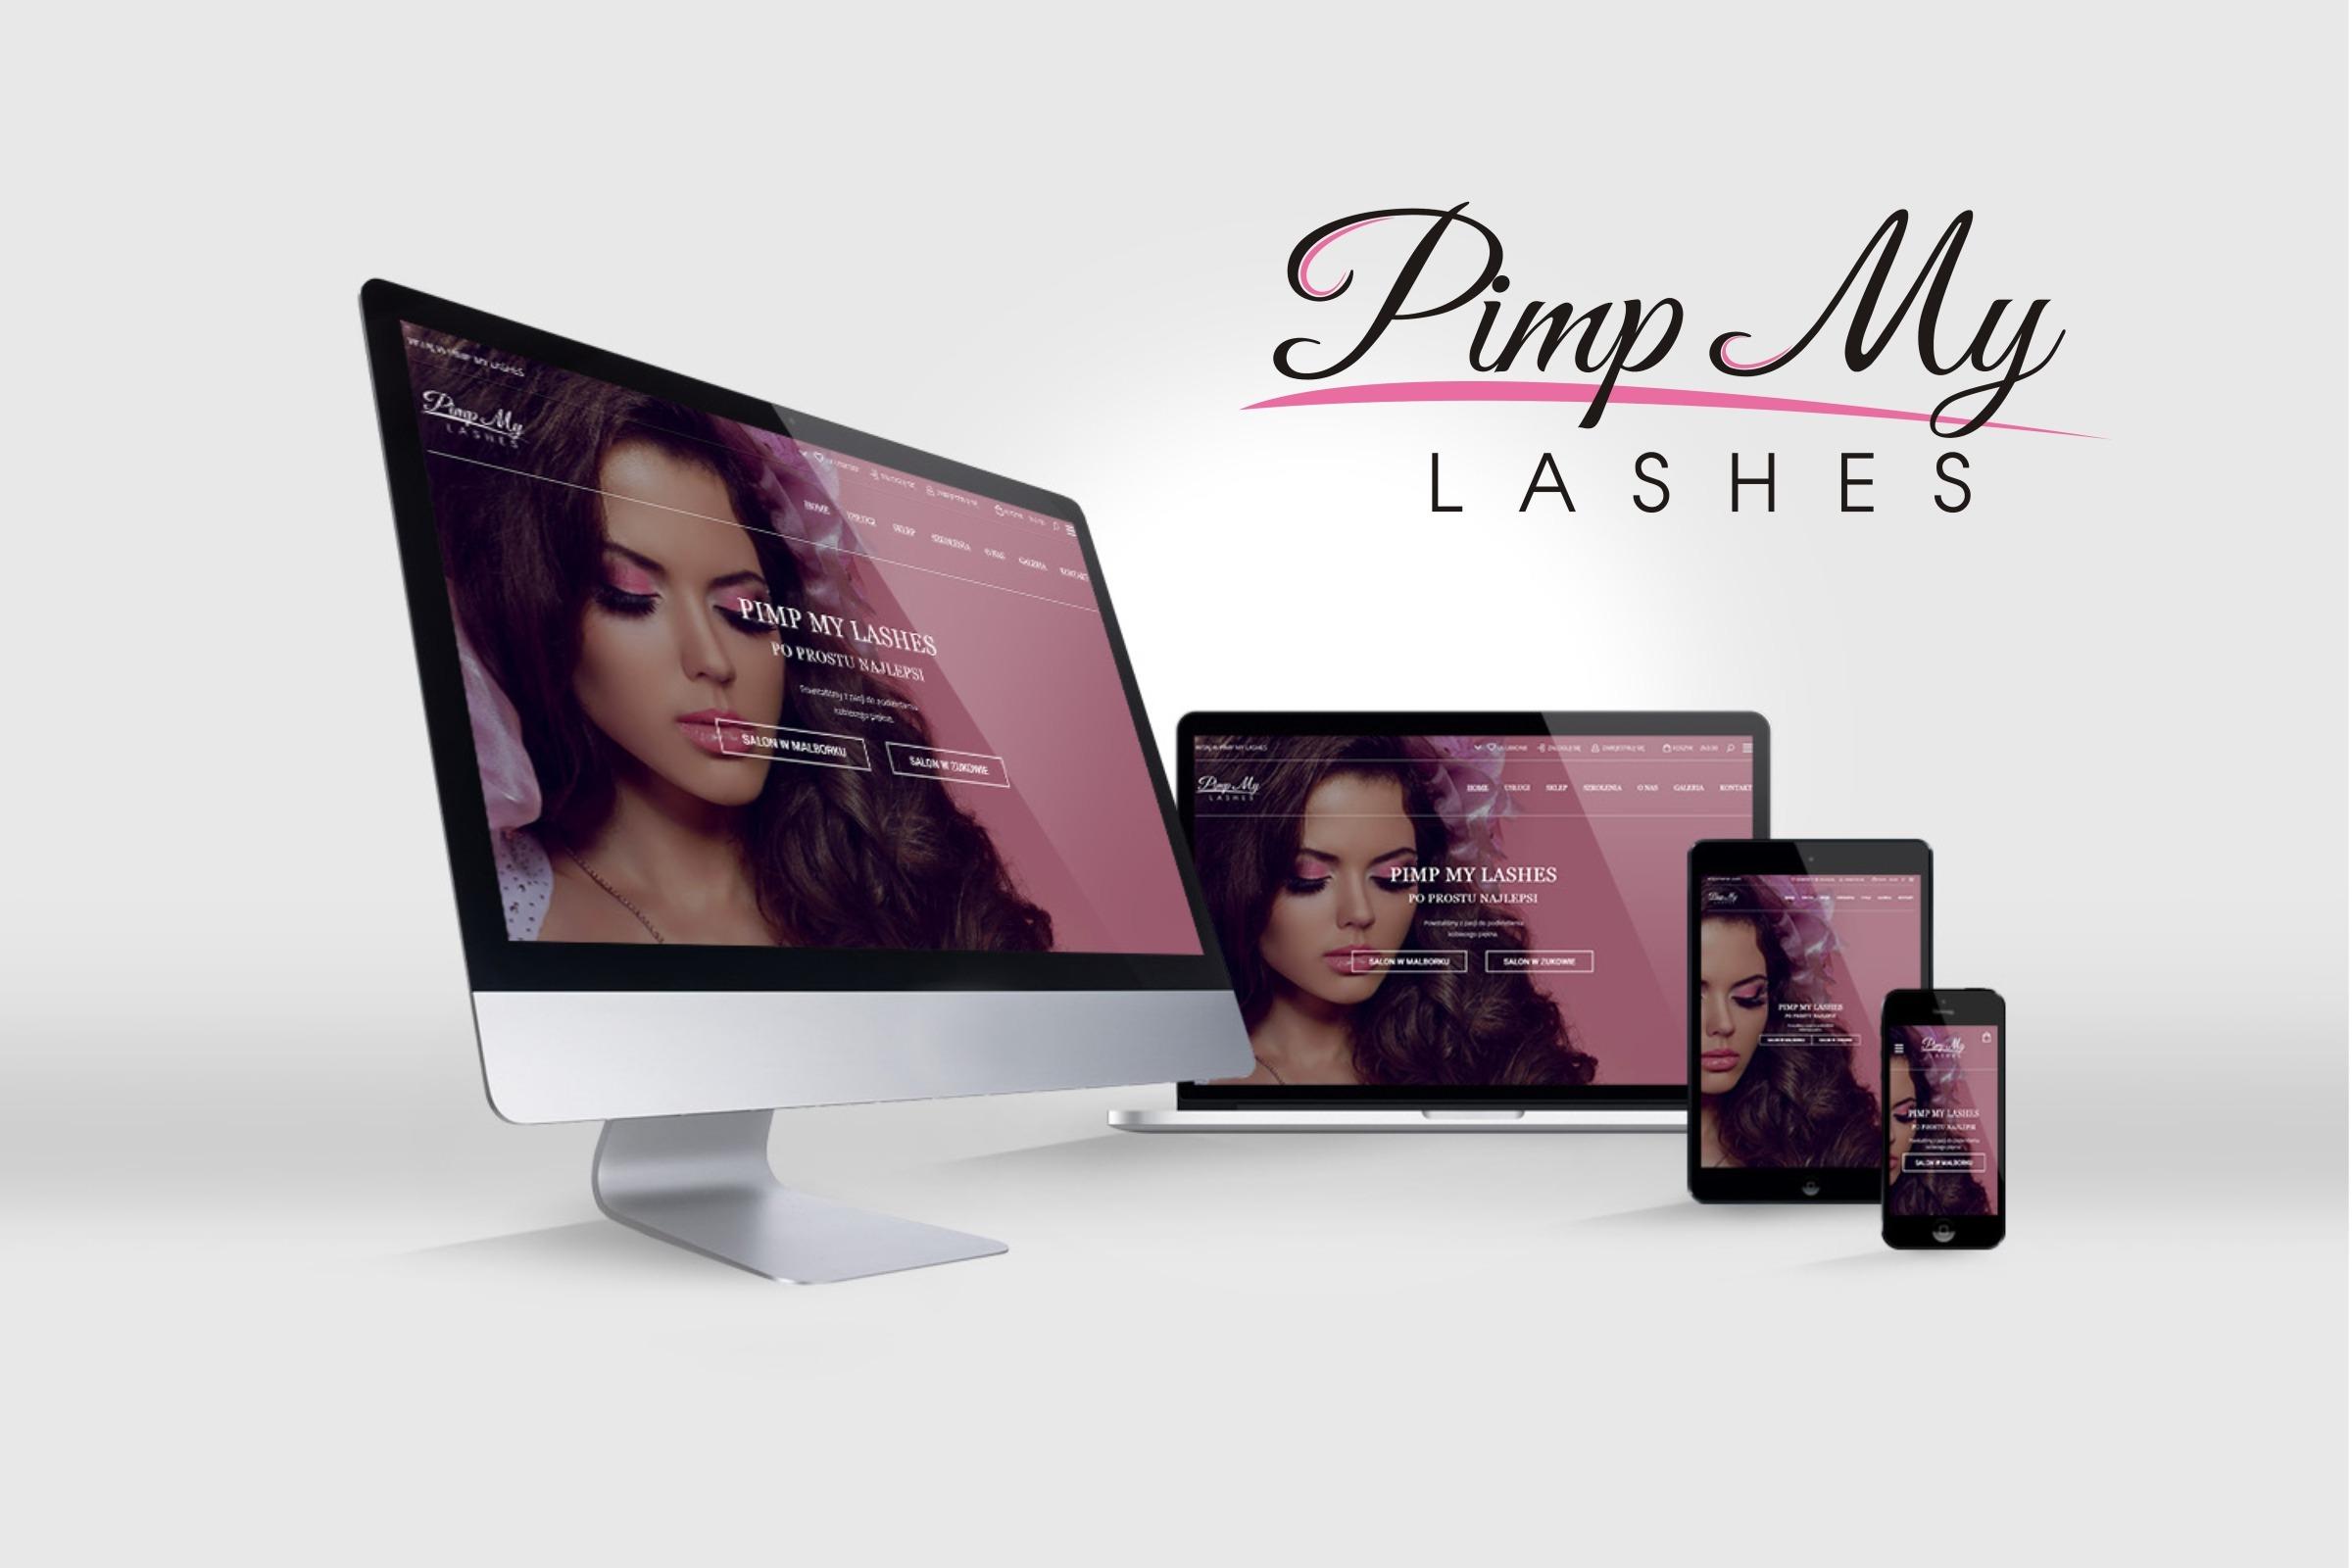 sklep internetowy pimp my lashes